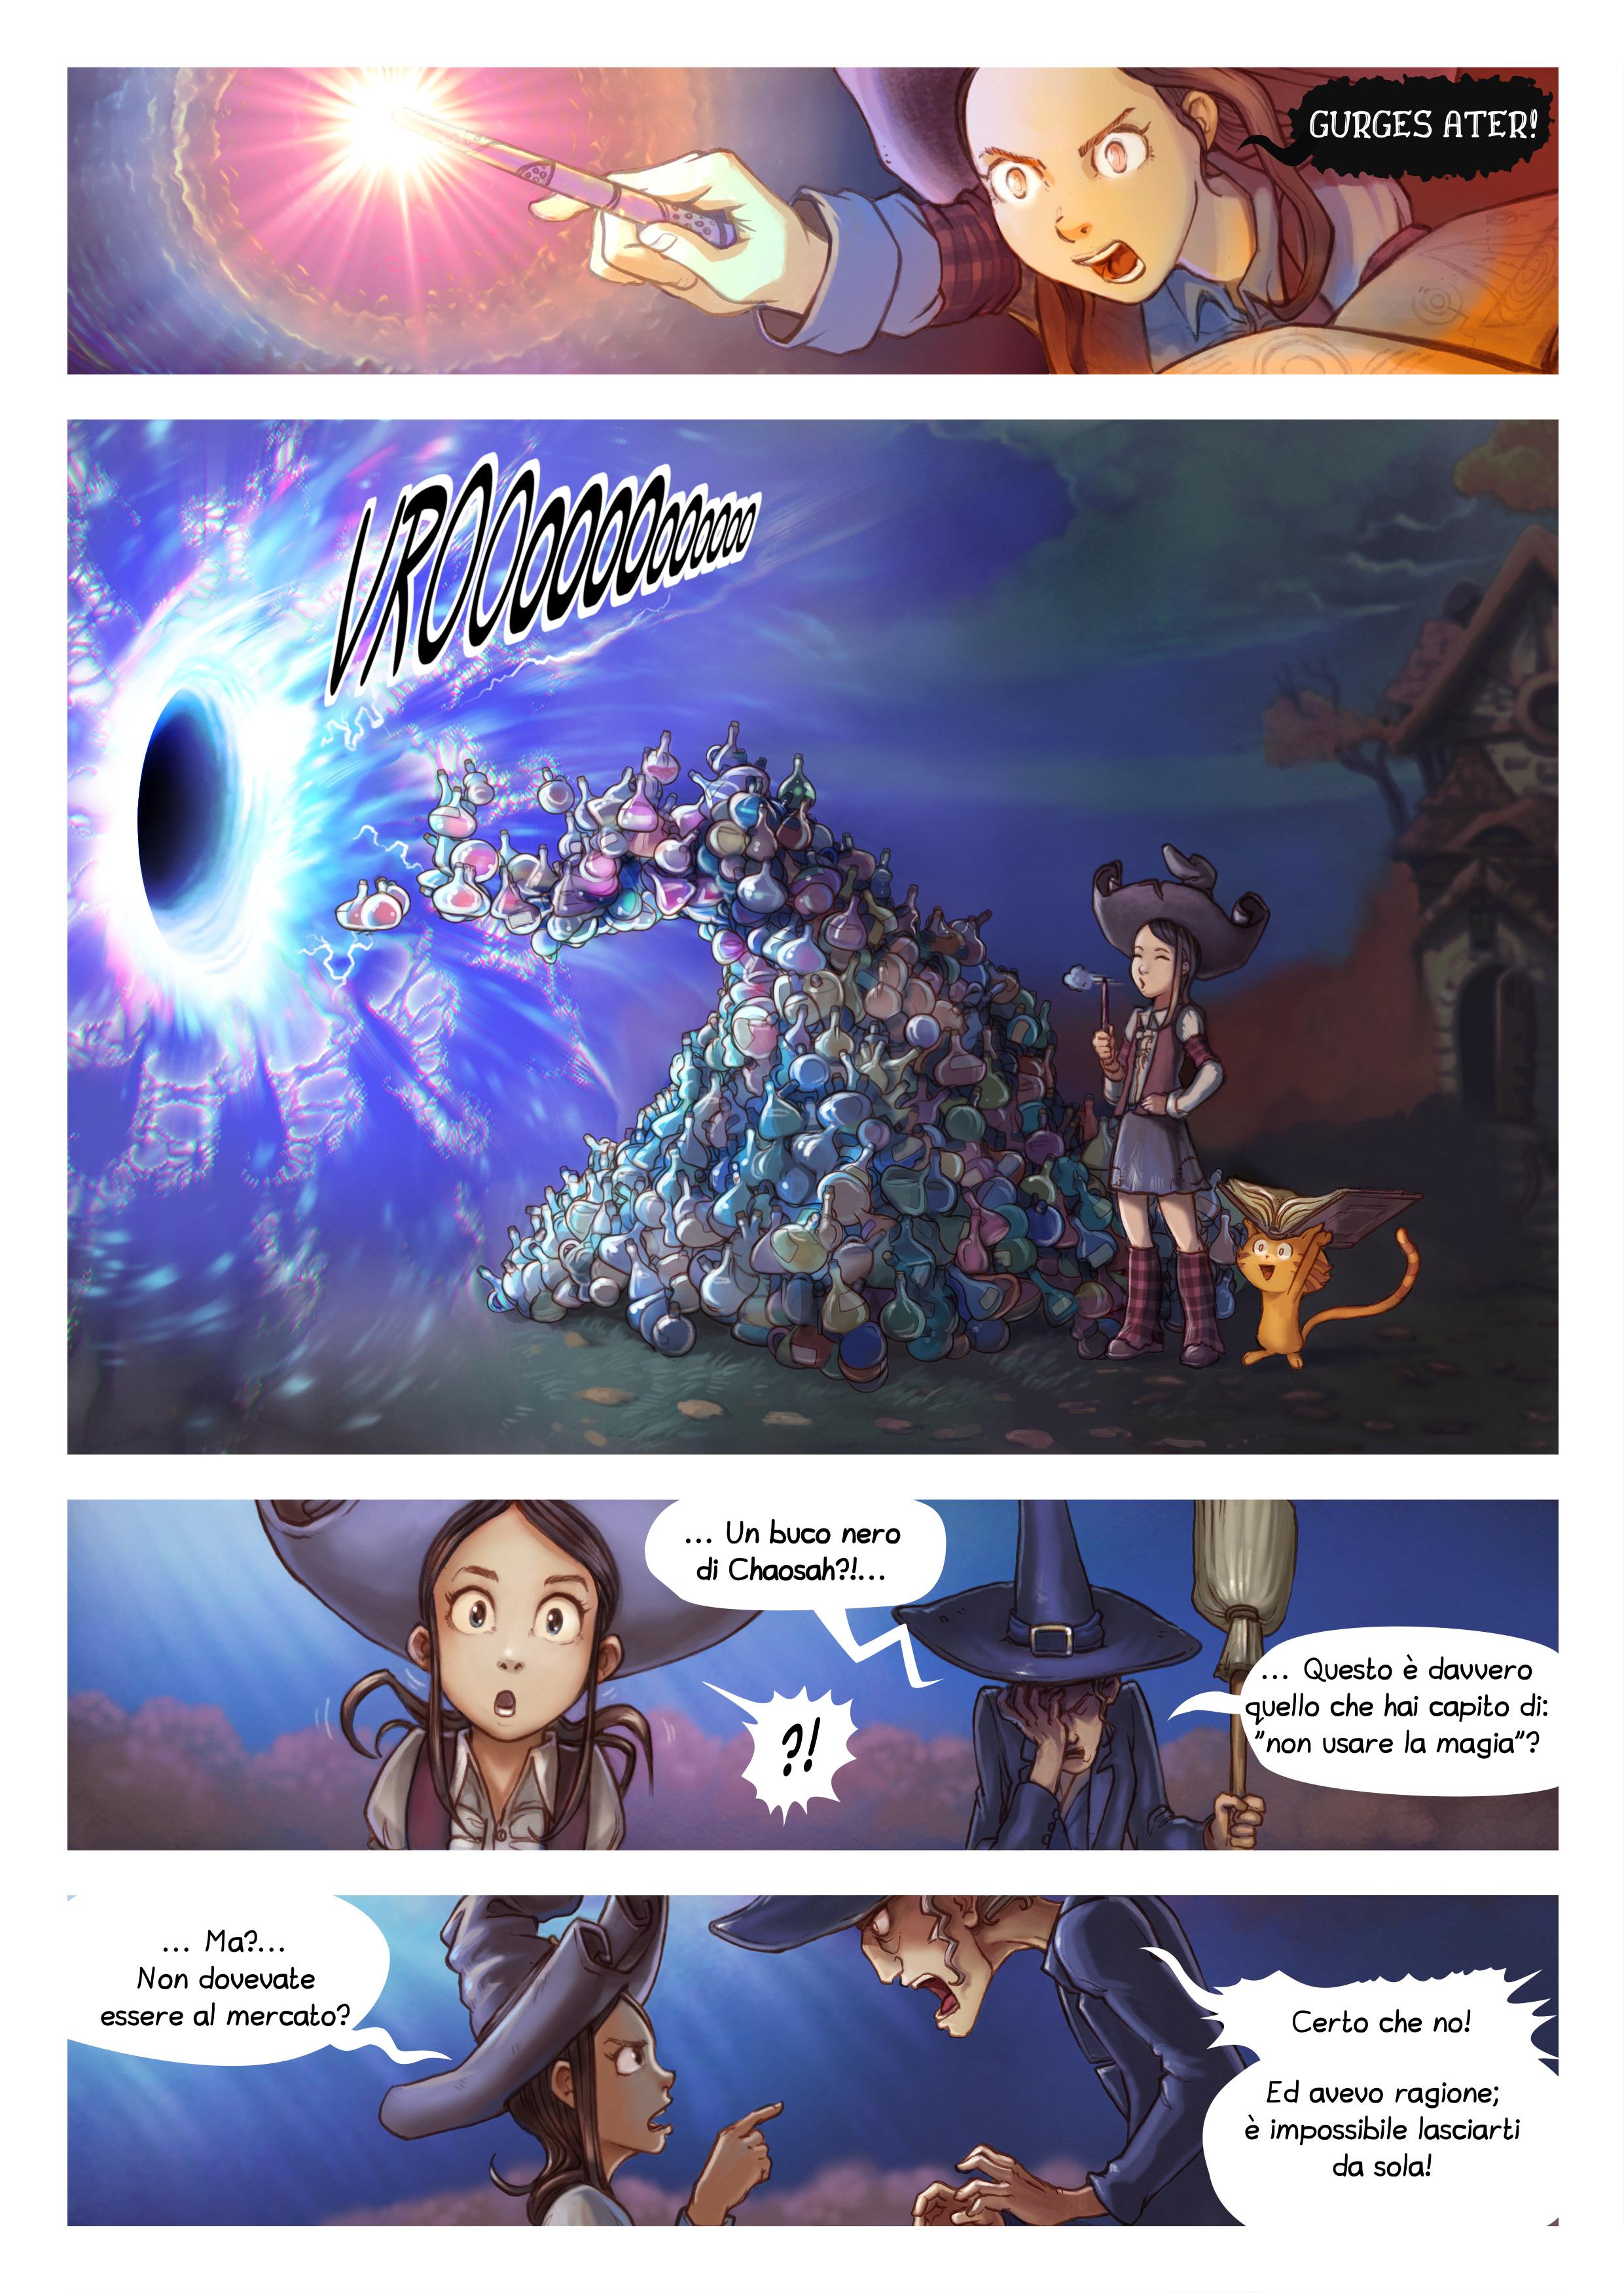 Episodio 12: Pulizie d'autunno, Page 4